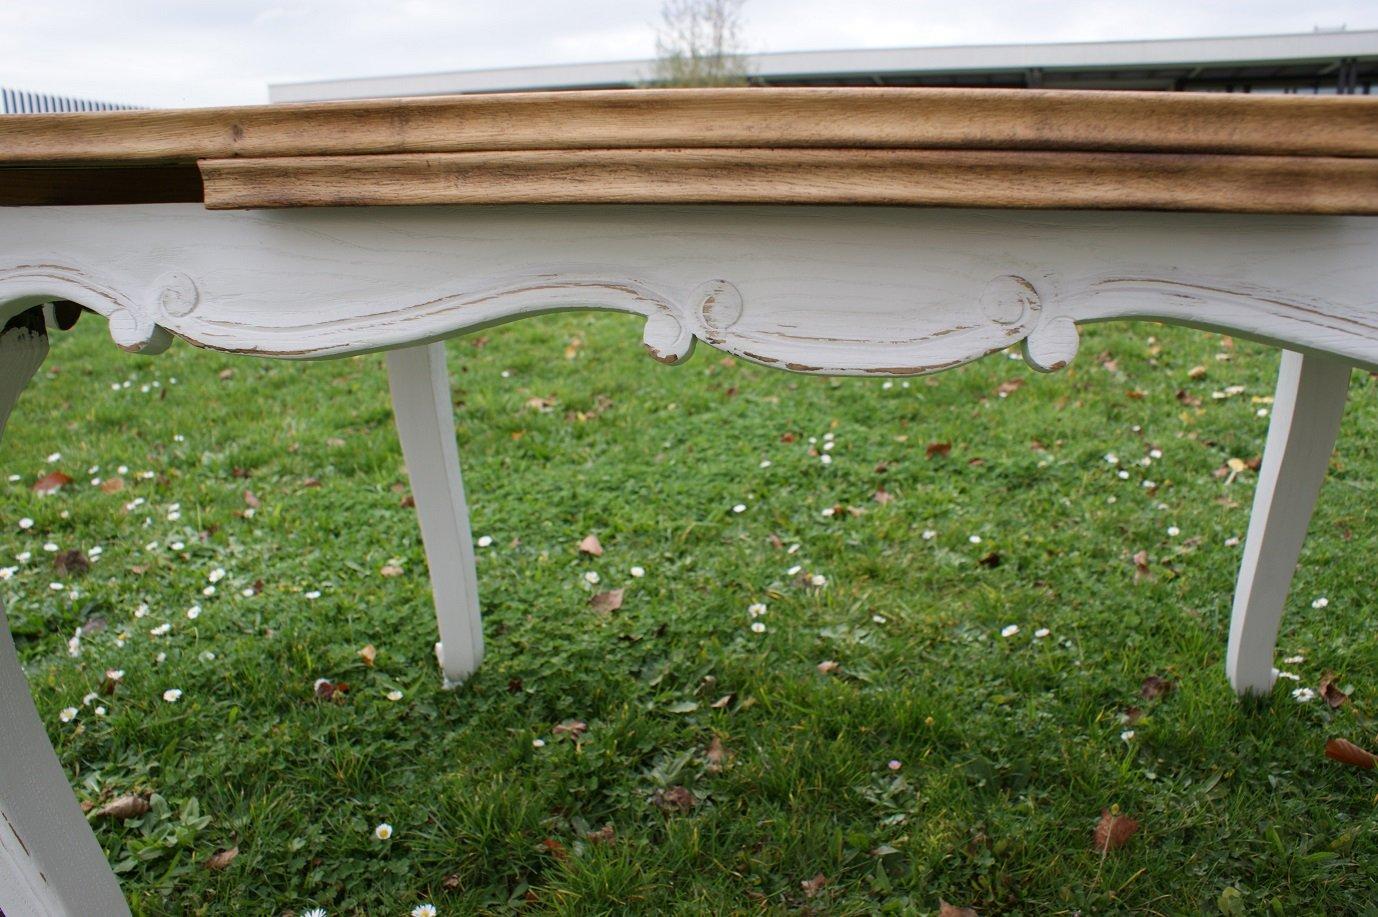 nos vieux meubles r nov s relook s et patin s. Black Bedroom Furniture Sets. Home Design Ideas